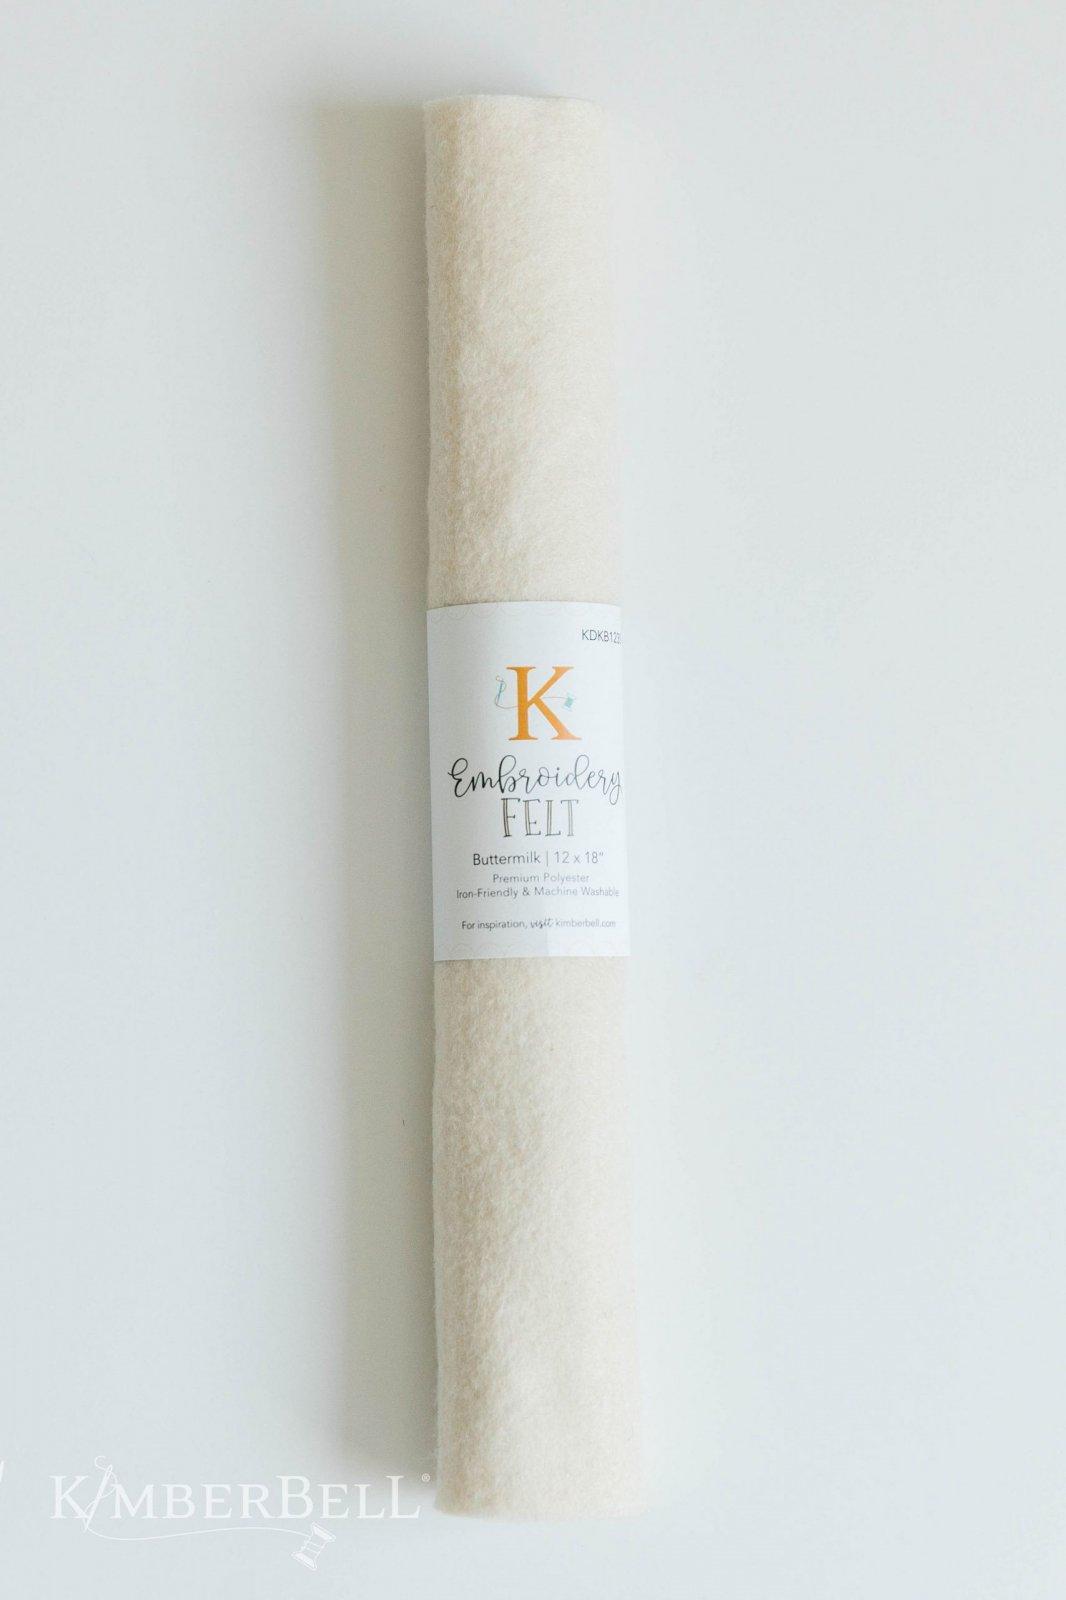 Kimberbell 12 x 18 Felt - Buttermilk